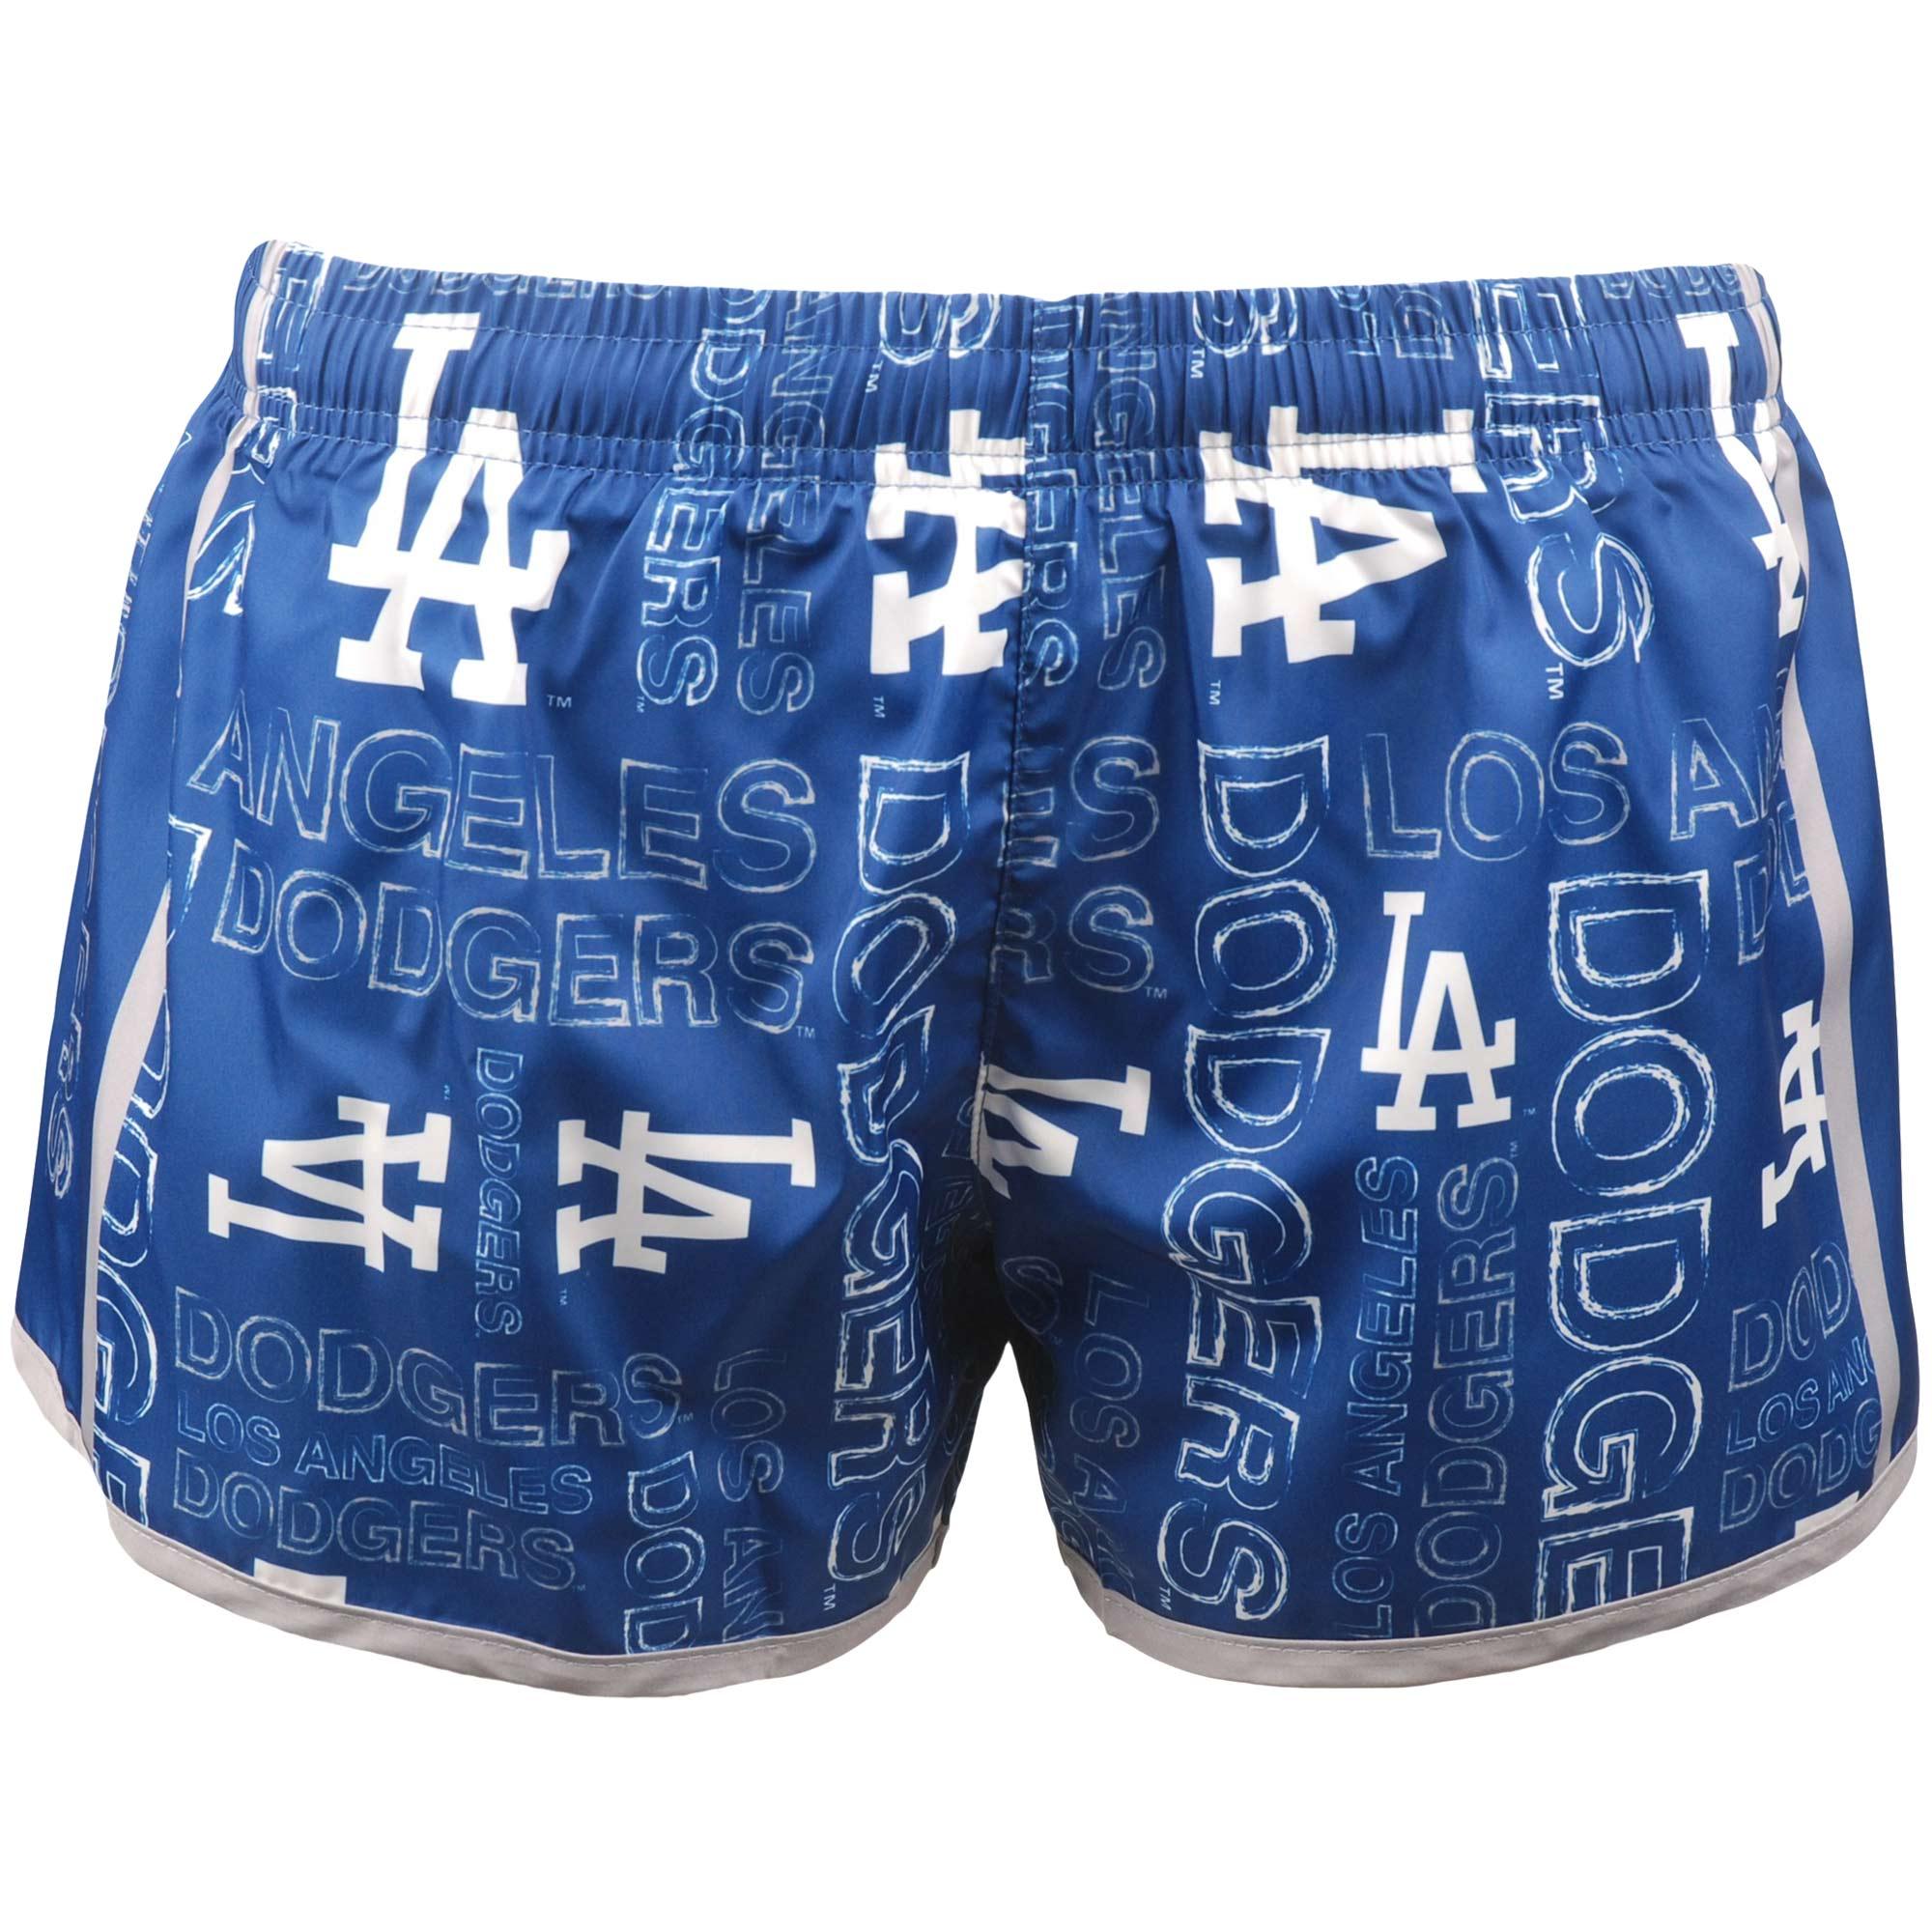 Los Angeles Dodgers Women's Repeat Logo Running Shorts - Royal